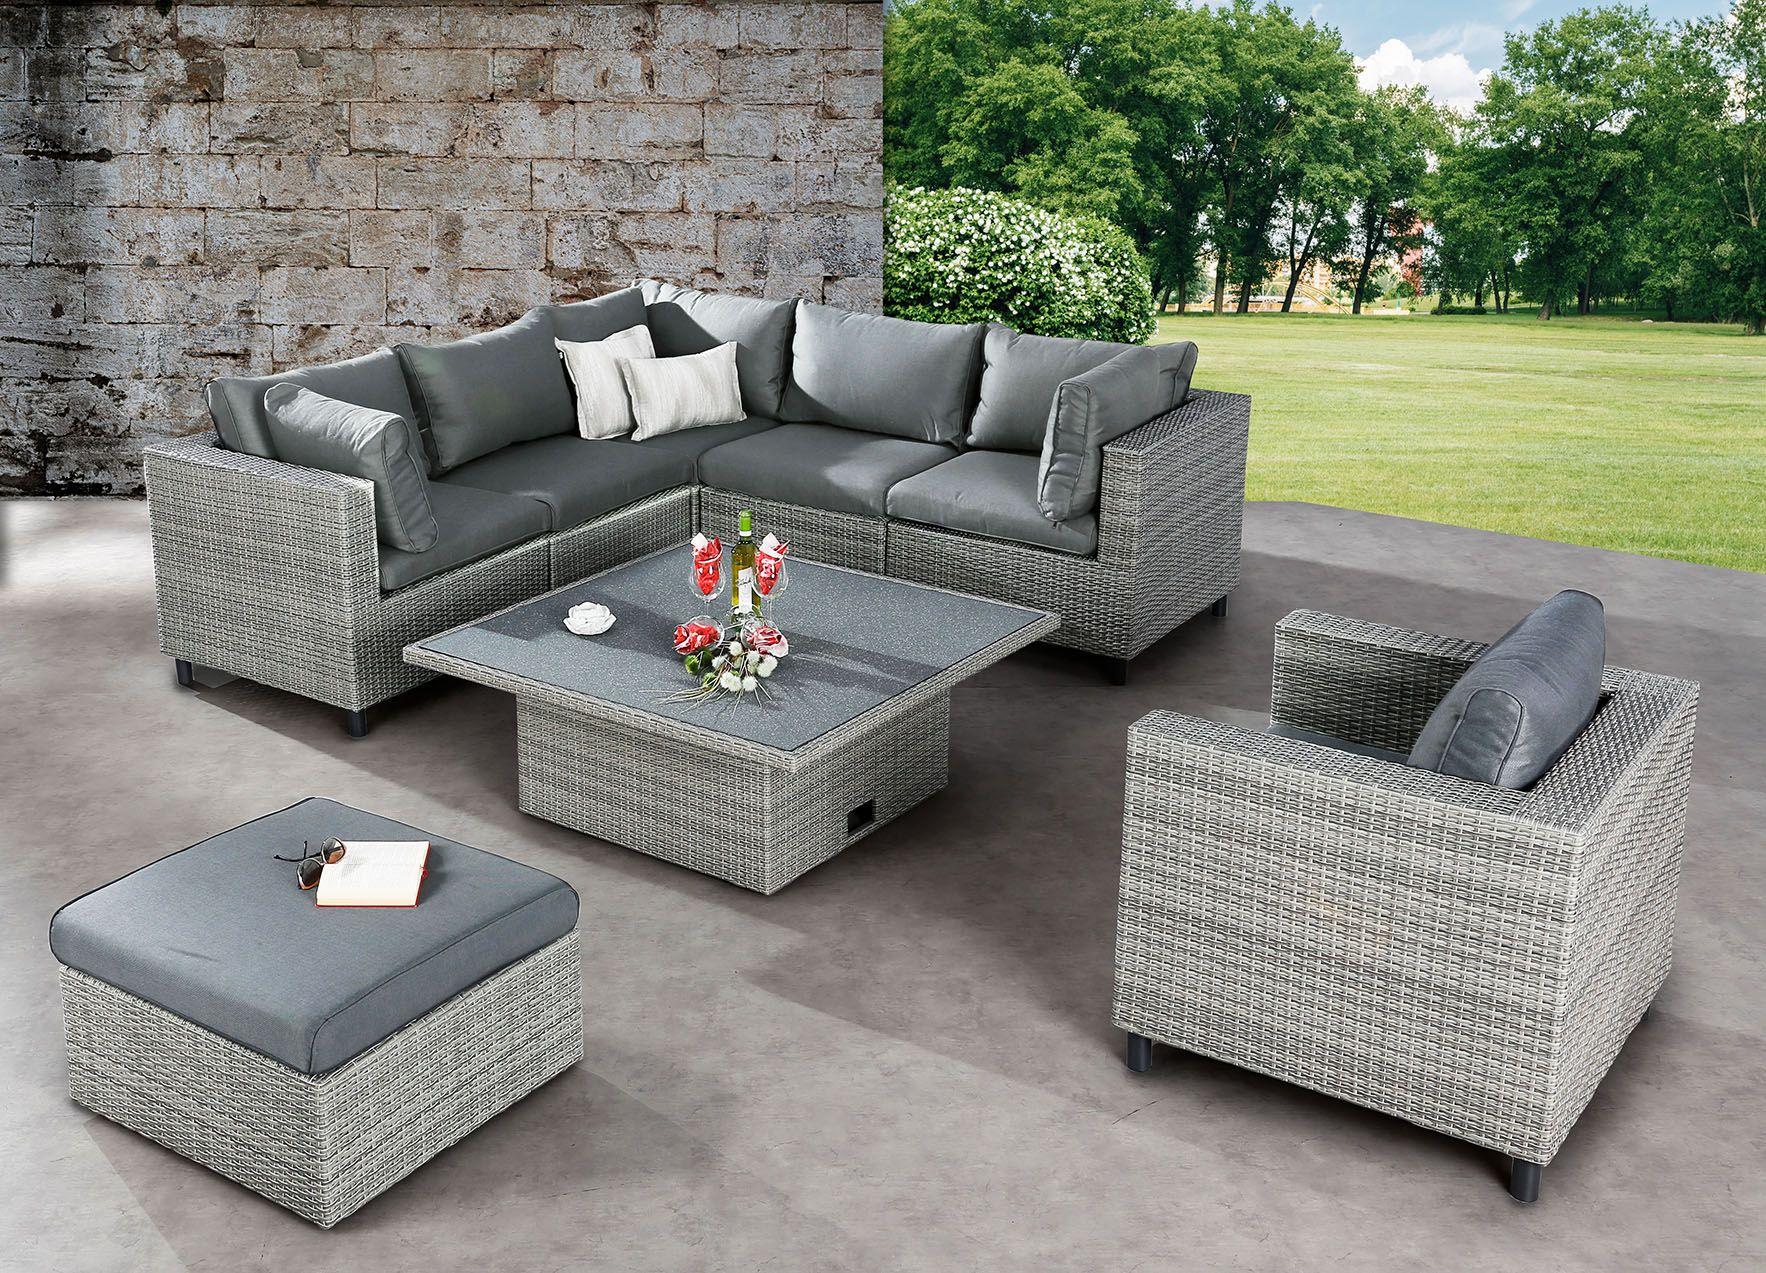 Full Size of Lounge Set Bonaire Warm Gray Gruppen Gartenmbel Wohnzimmer Megasofa Aruba